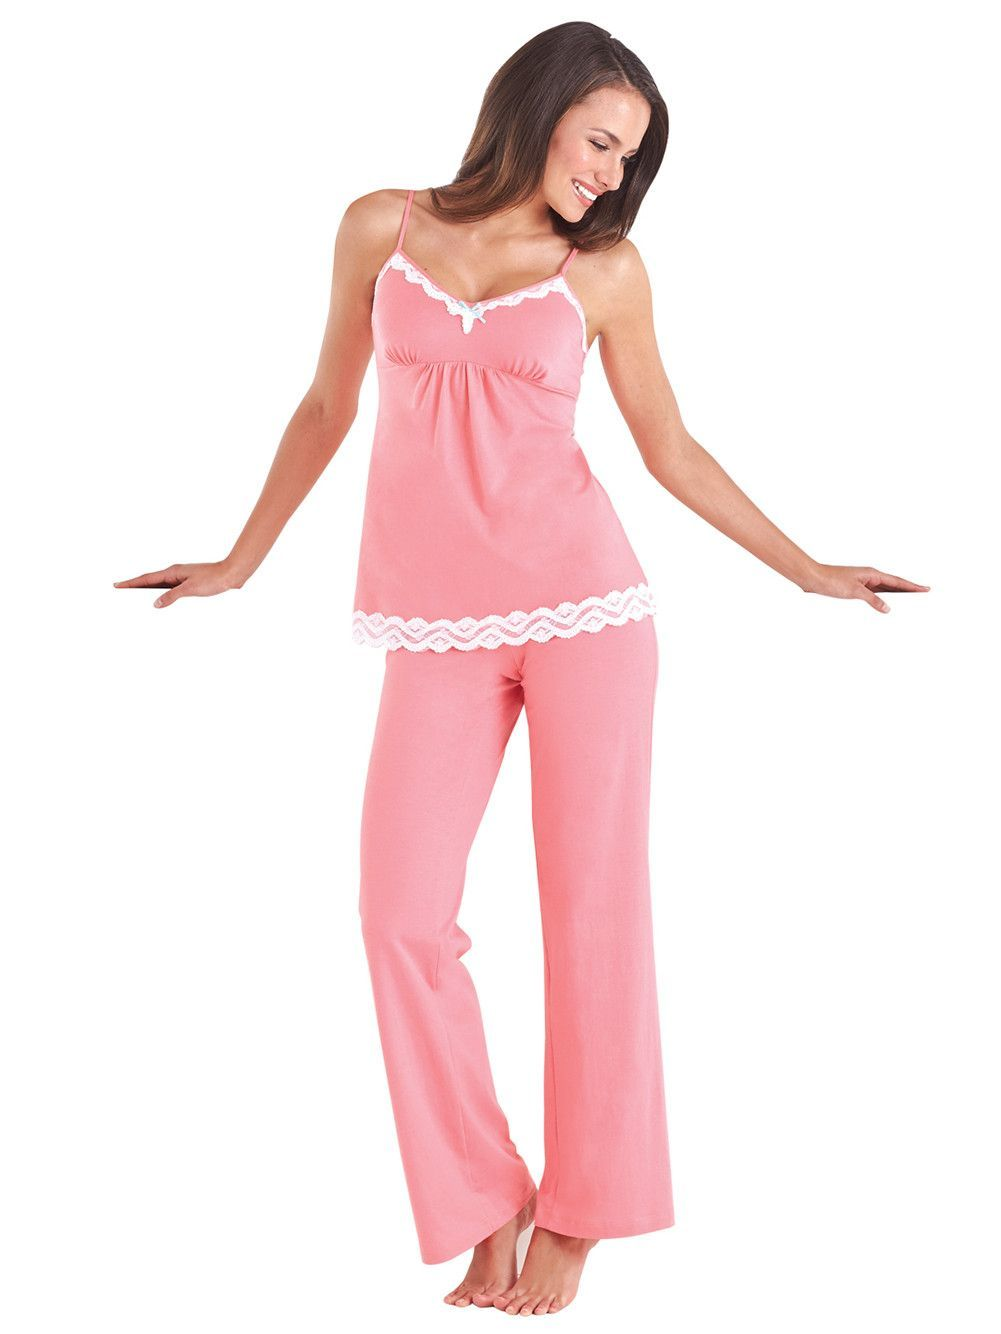 3793 Pijama Dama Ilusion Ropa Moda Estilo Ropa Intima